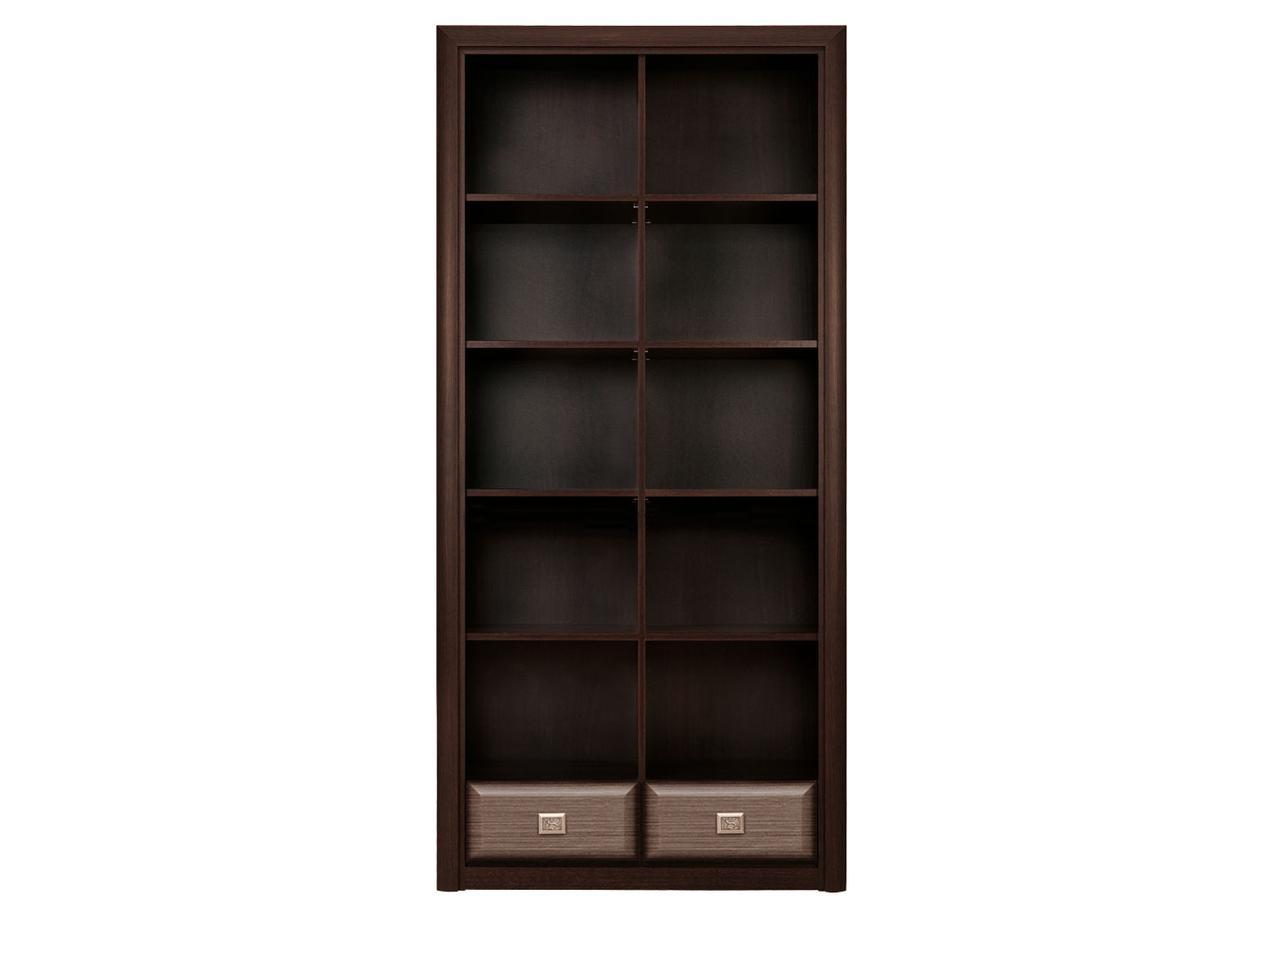 Шкаф витрина 2Д , коллекции Коен МДФ, Штрокс Темный, БРВ Брест (Беларусь)